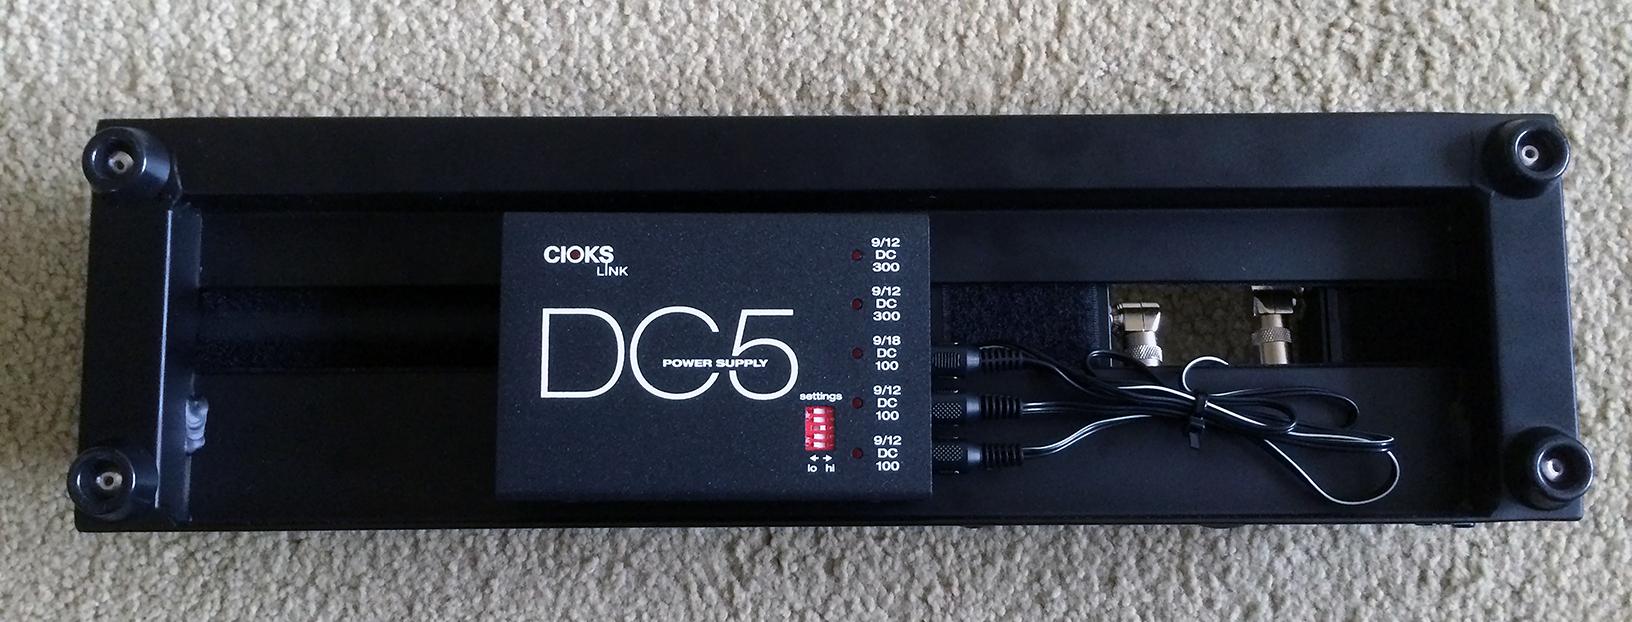 The Cioks DC5 power supply mounted under a Pedaltrain Nano+ pedalboard.